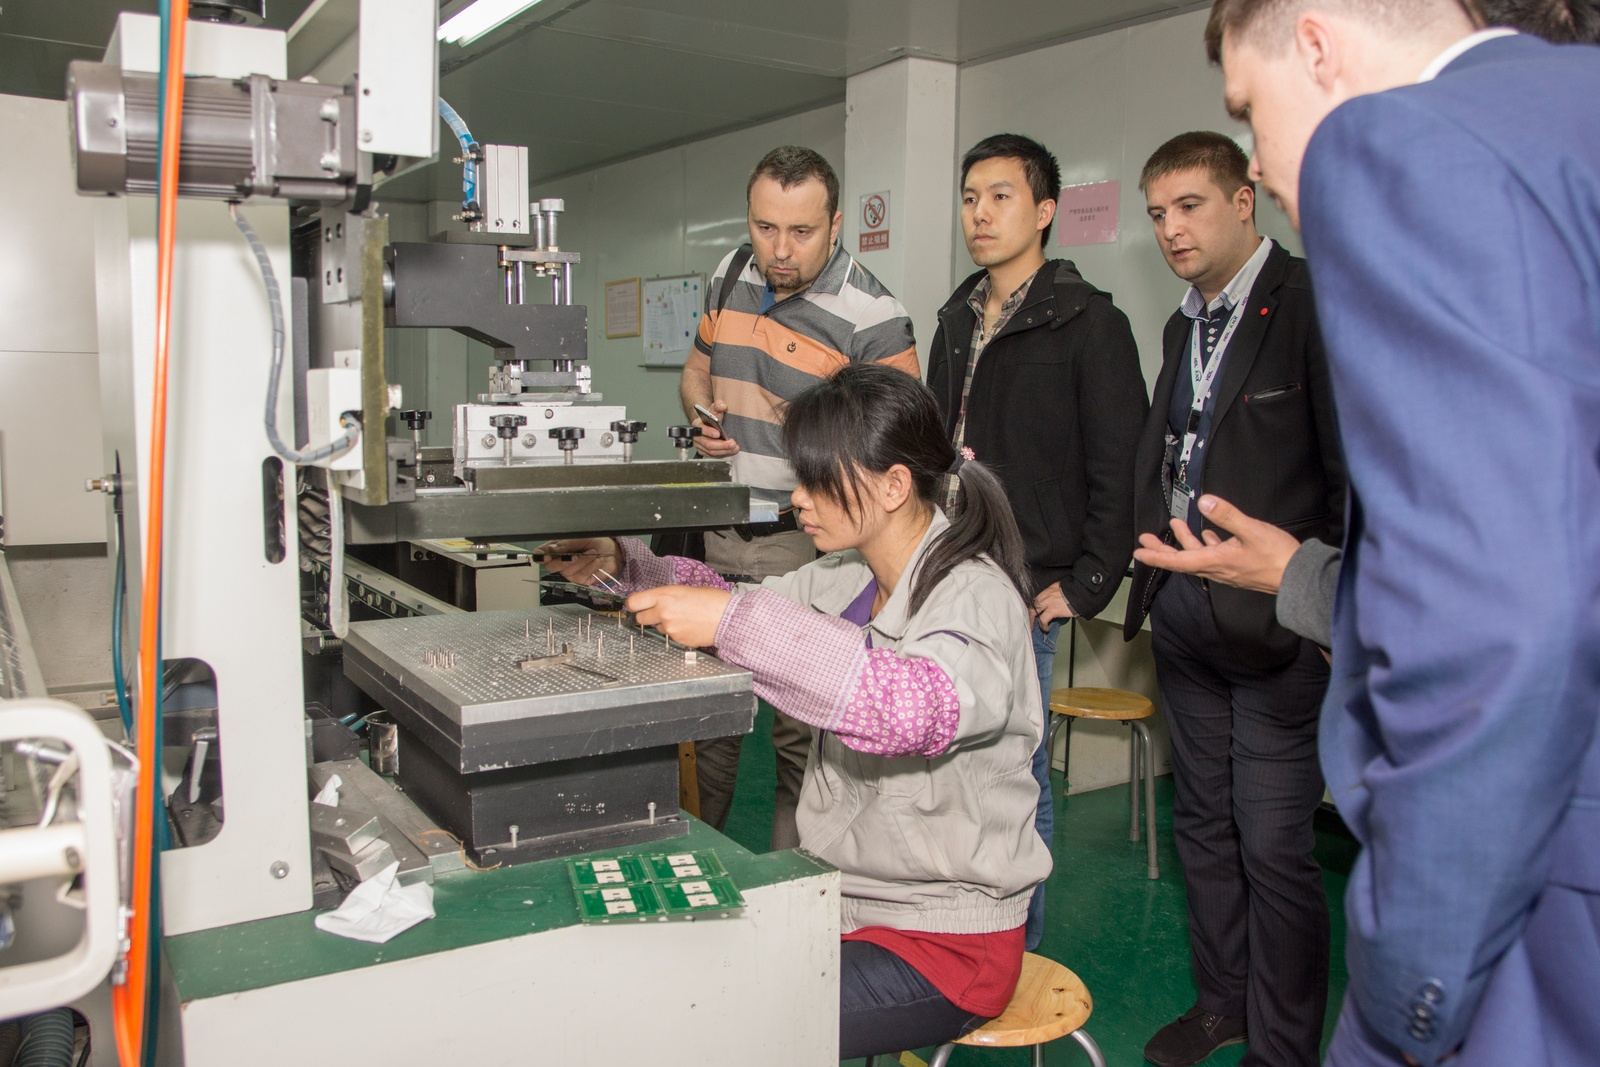 Китай. Завод устройств для «Умного дома». Учимся и учим - 31